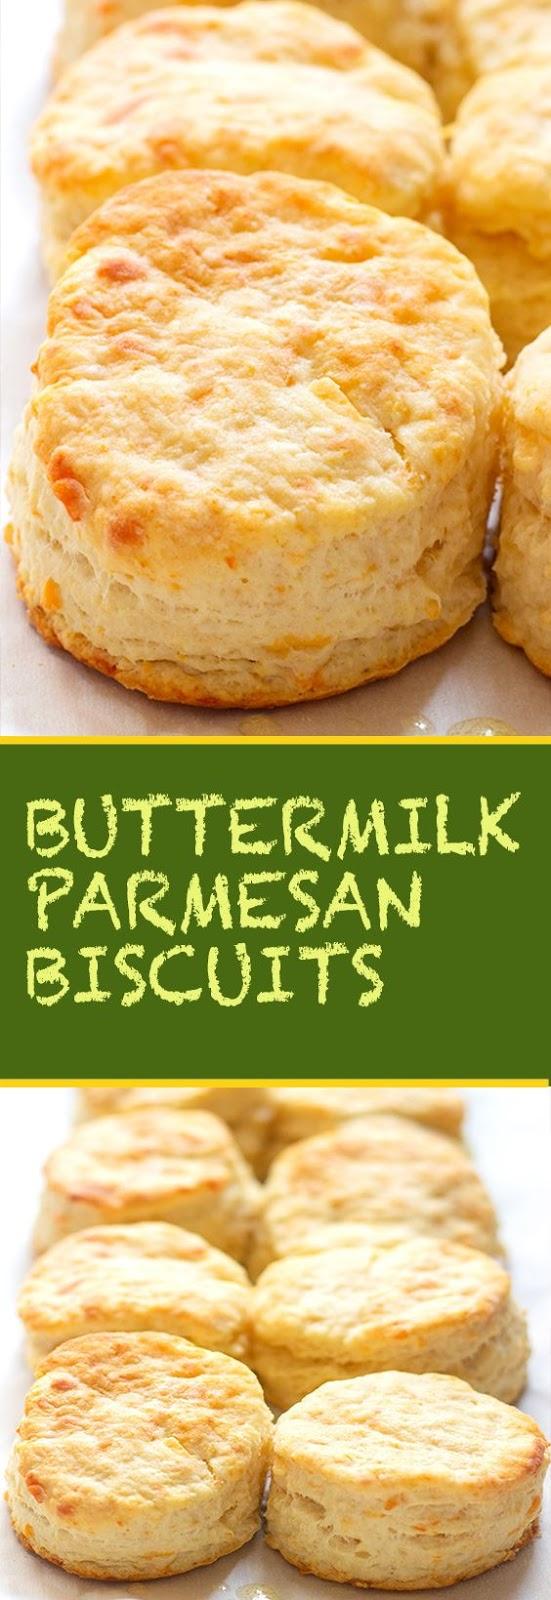 Buttermilk Parmesan Biscuits